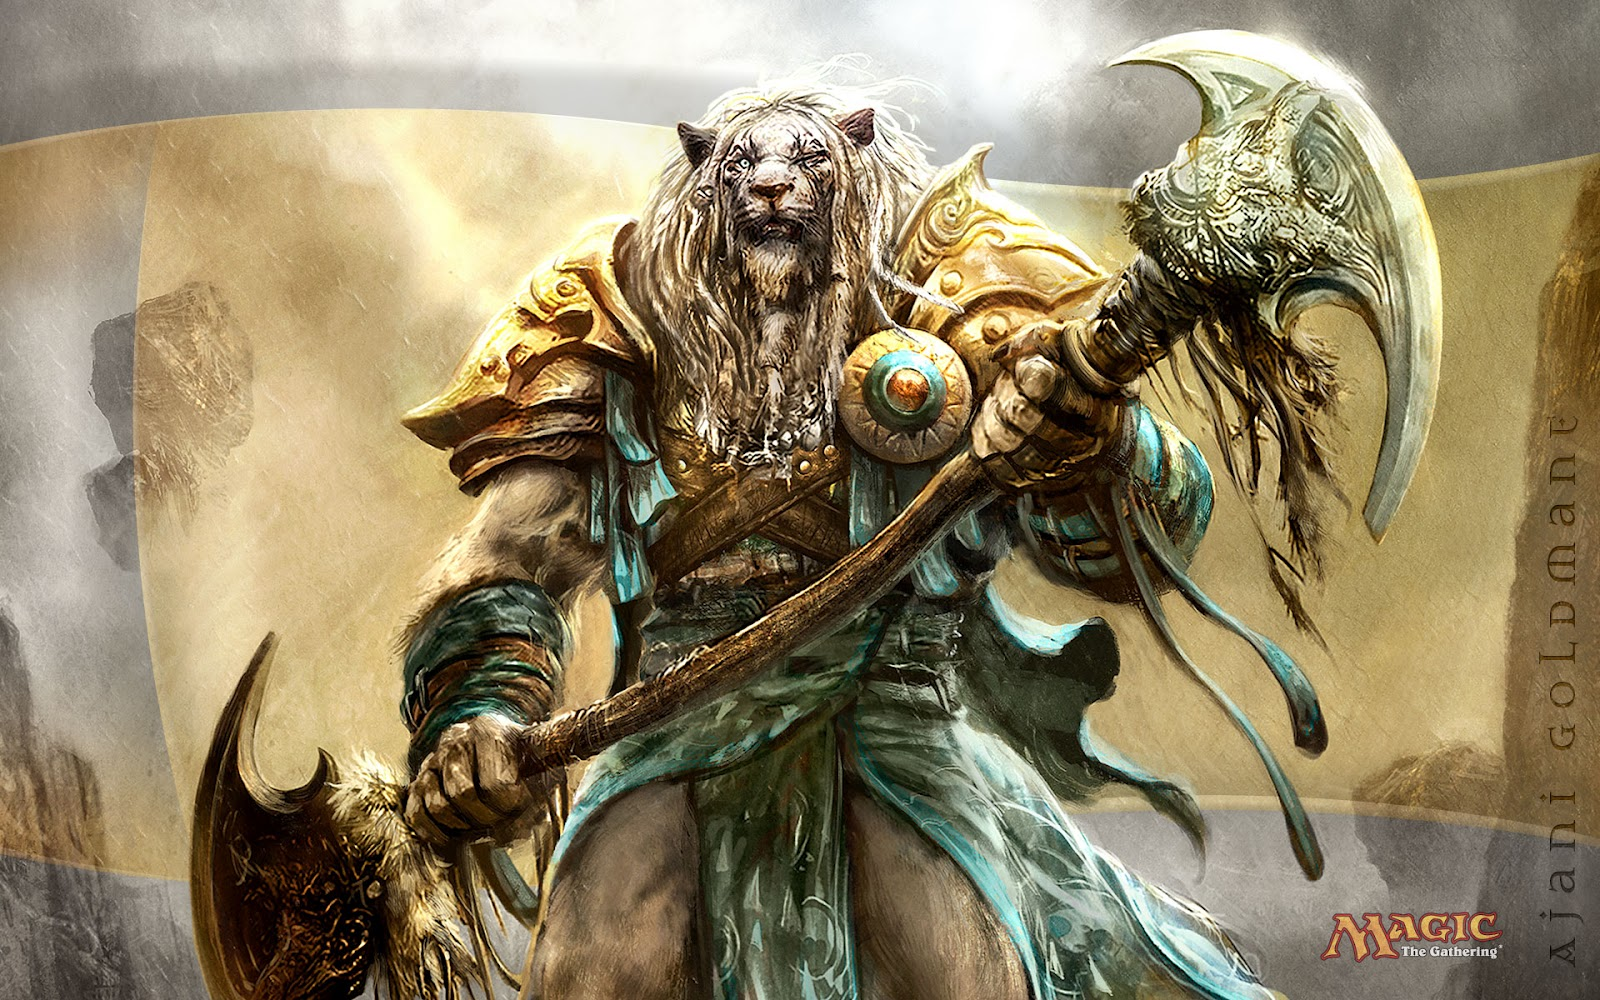 Simple   Wallpaper Horse Warrior - lionman-fantasy-warrior-best-quality-desktop-wallpaper  Trends_6178100.jpeg